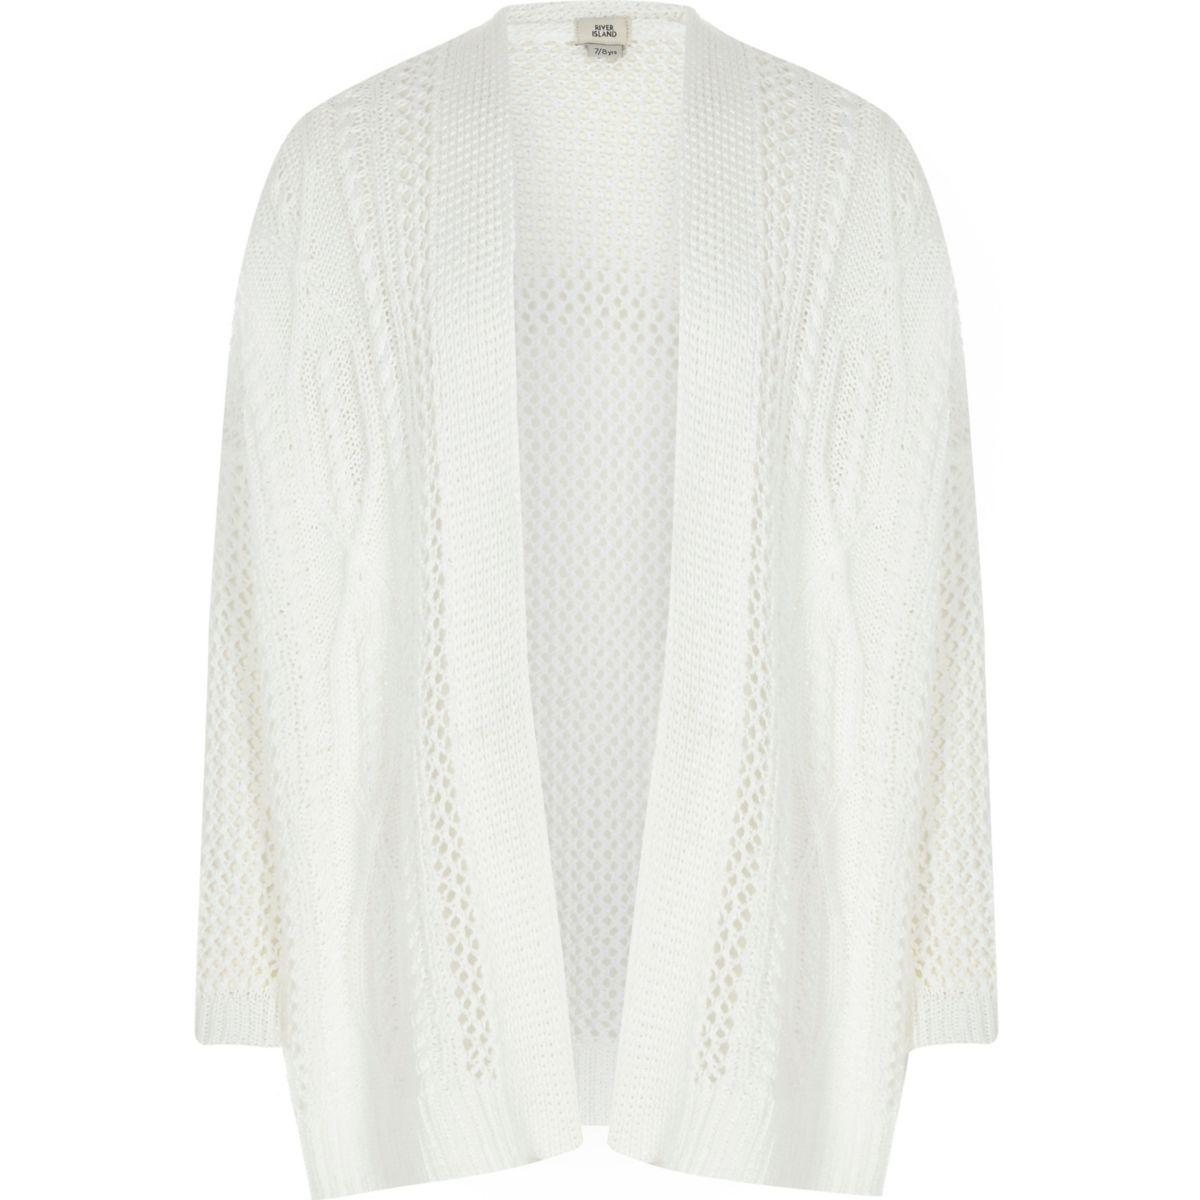 Girls white ladder knit open front cardigan